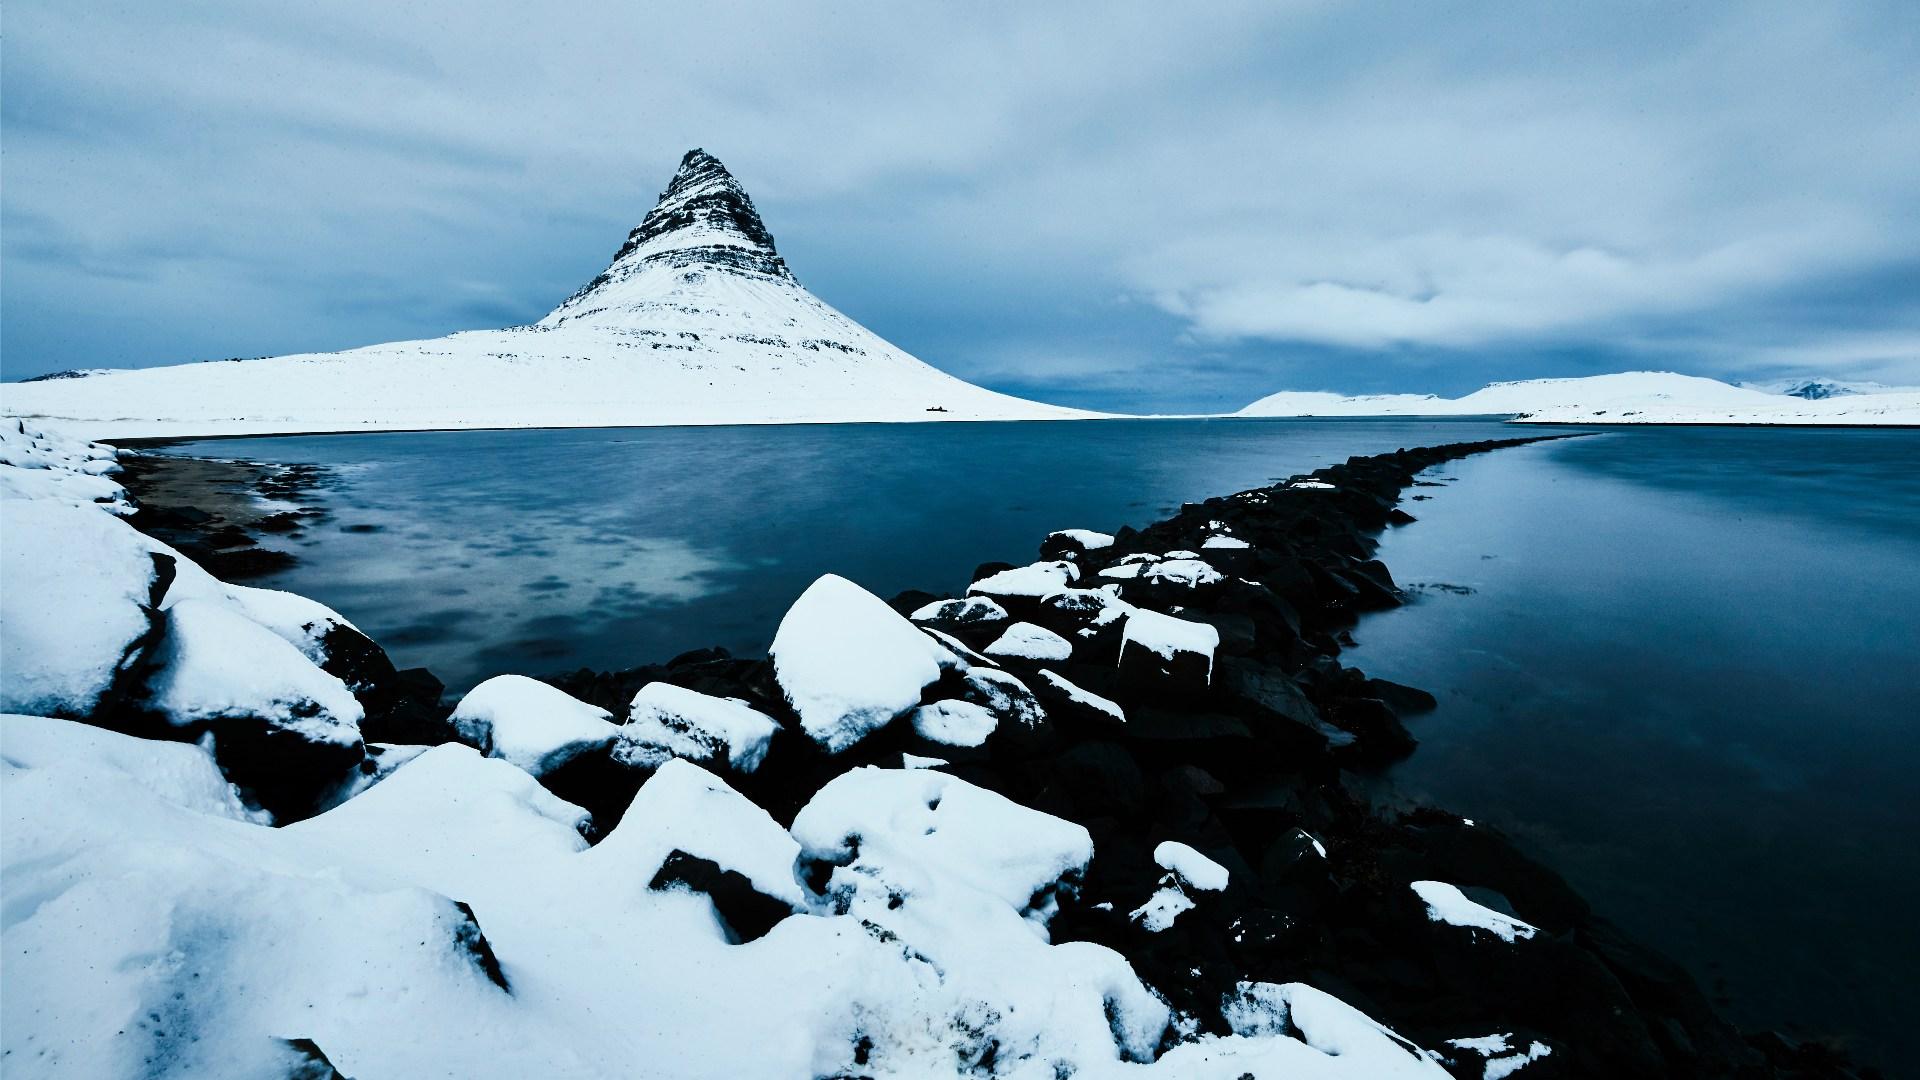 The Kirkjufell mountain on the Snæfellsnes peninsula.